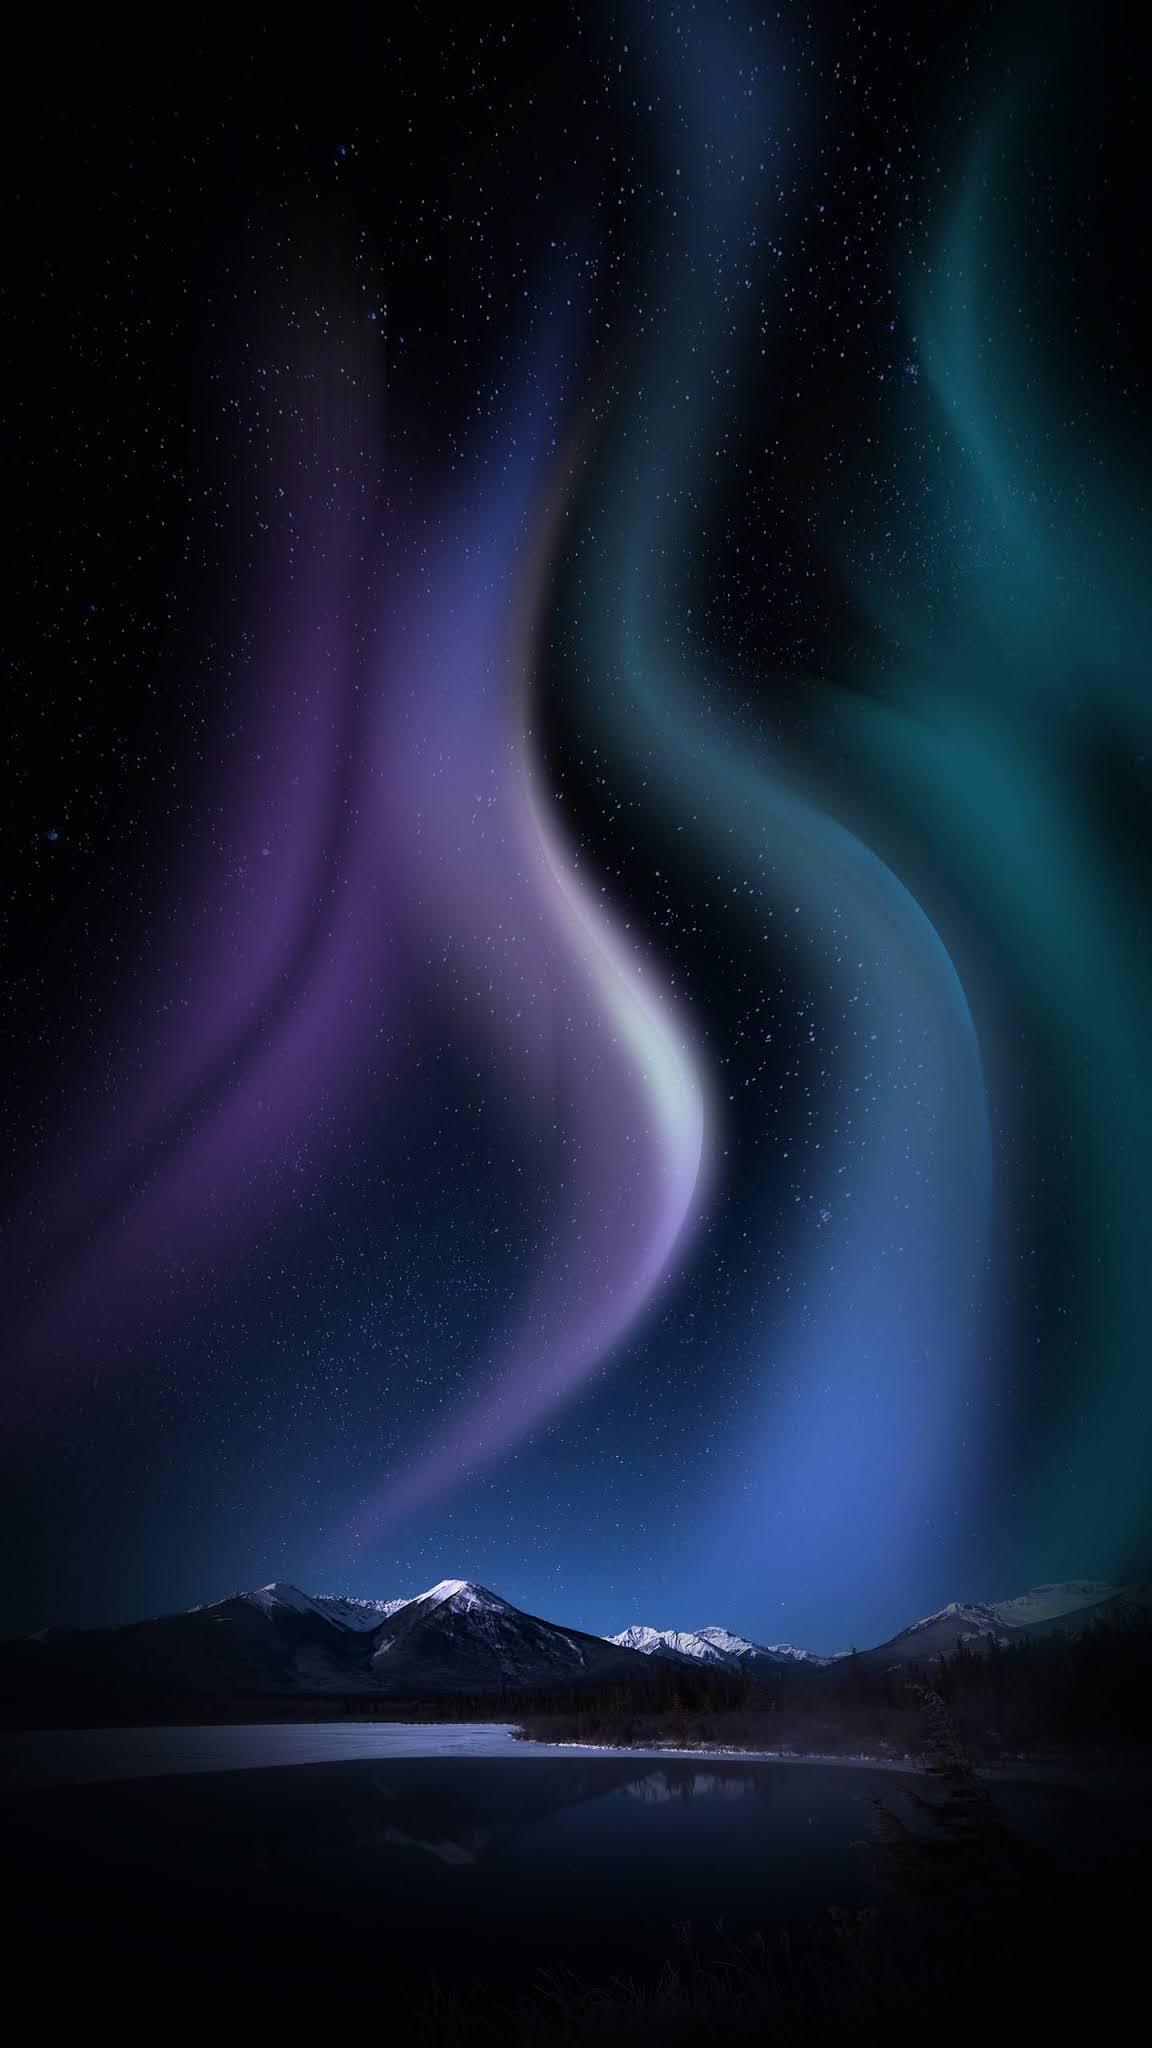 aurora 4k mobile wallpaper